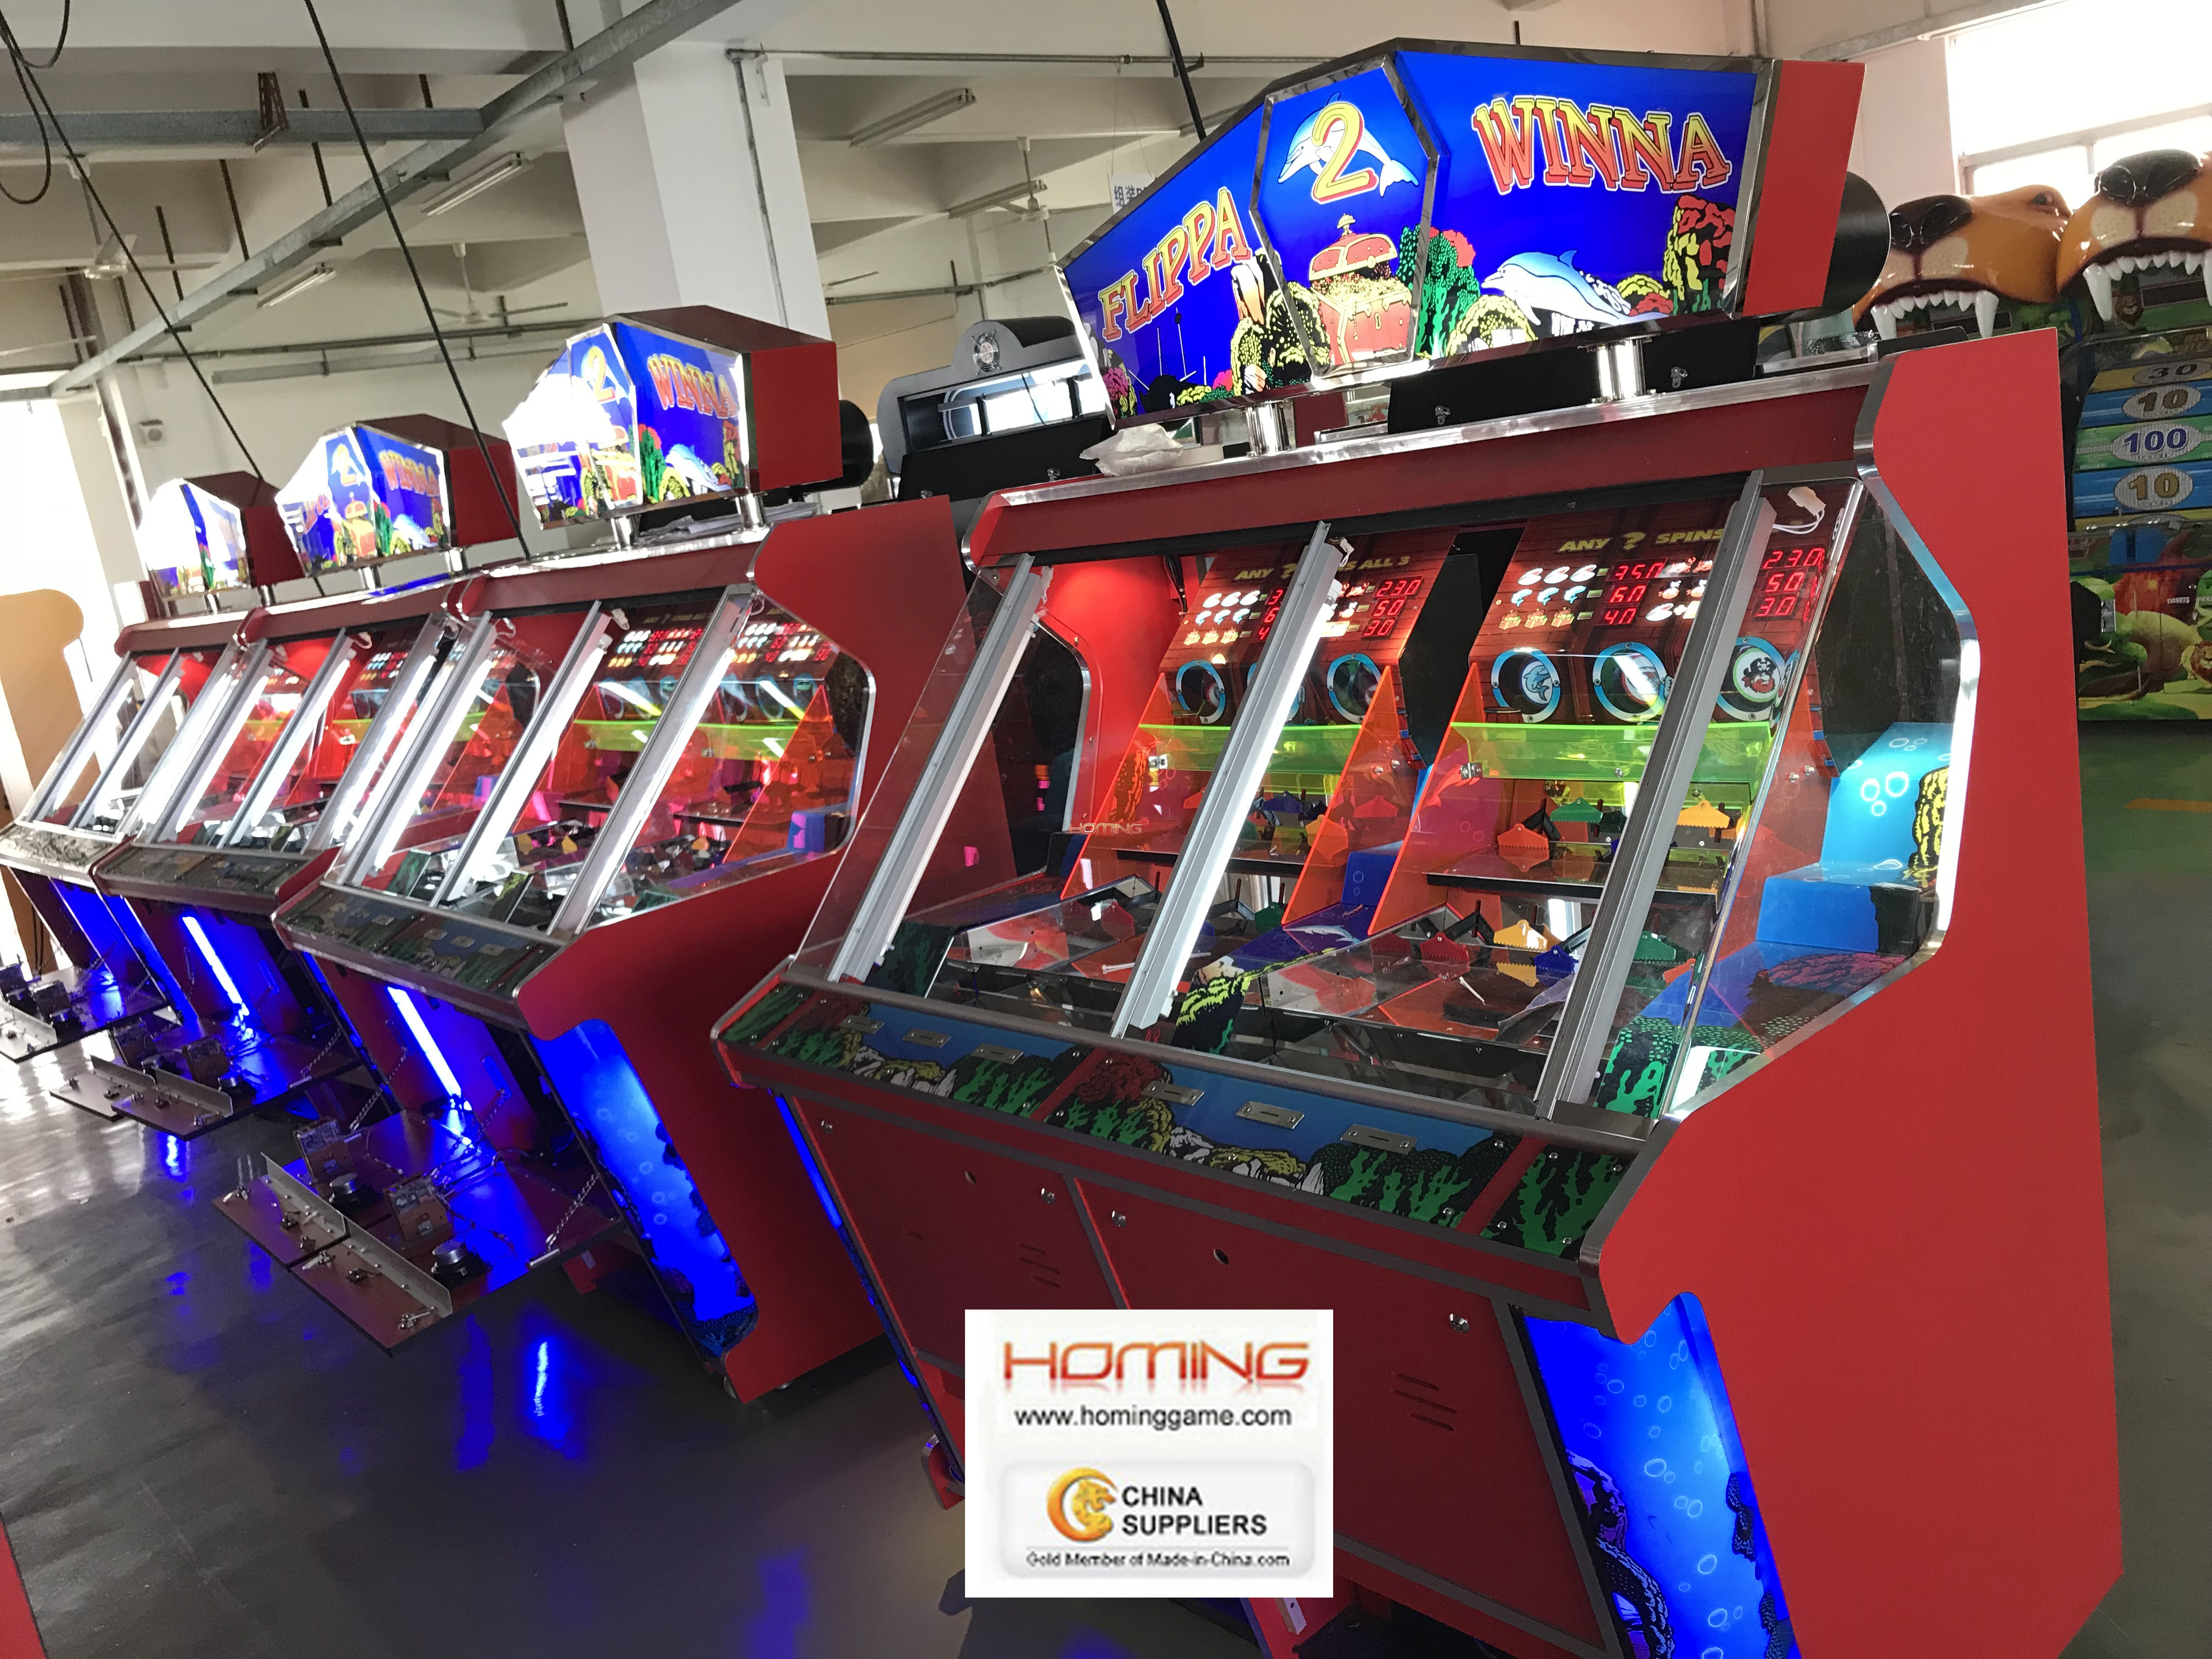 Arcade coin machine token clipart image Flippa Winna Arcade Coin Puhser Game Machine Flippa Winna Flippa ... image